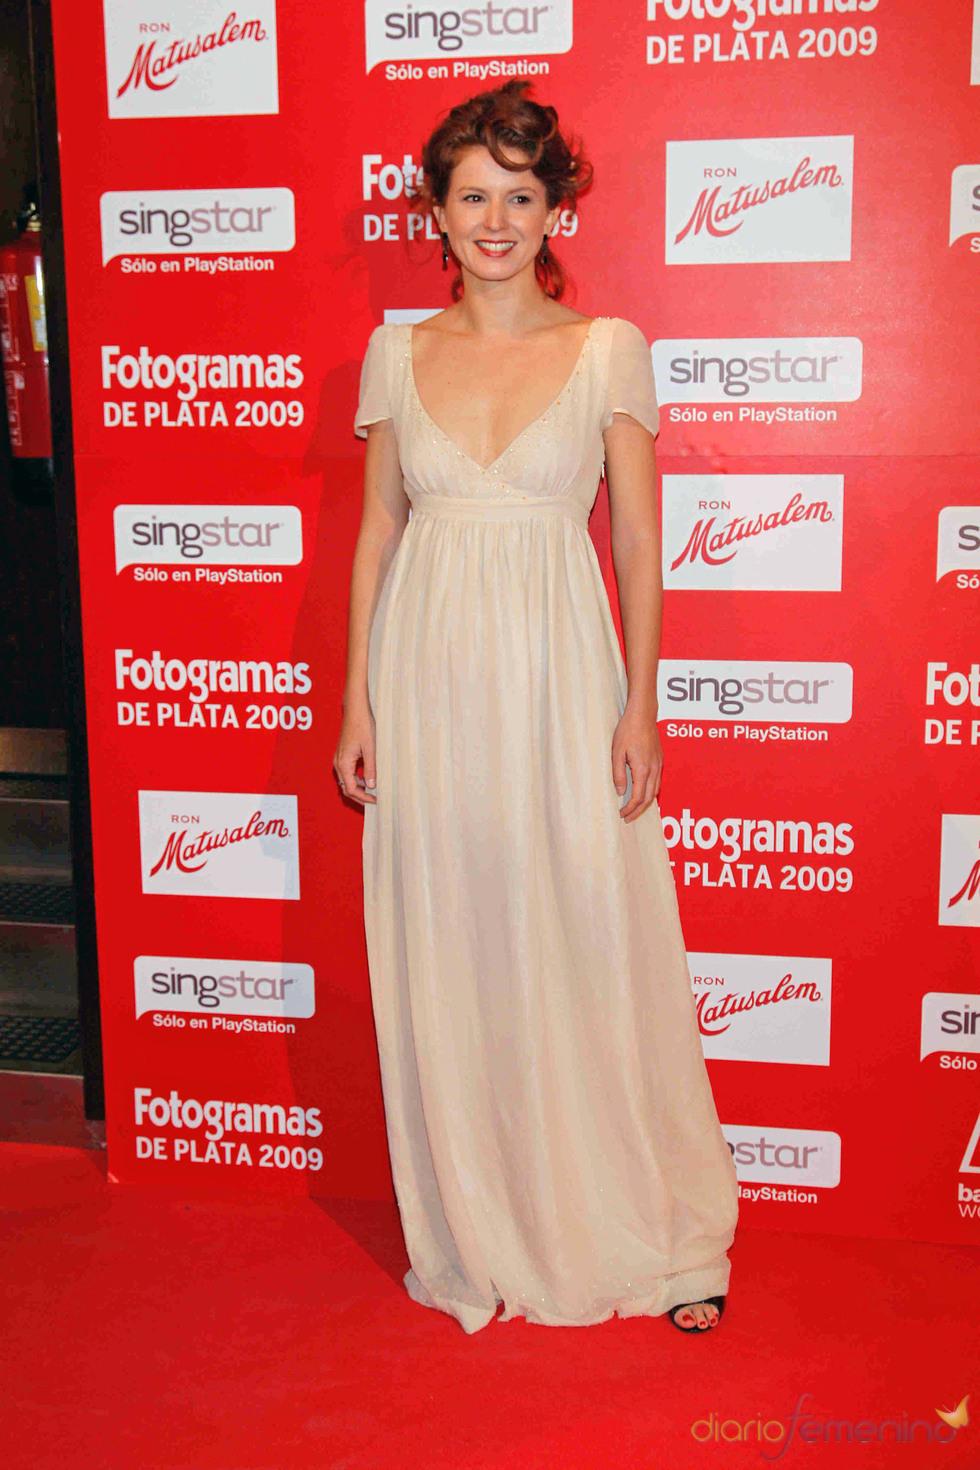 Fotogramas de Plata 2009: Marian Aguilera